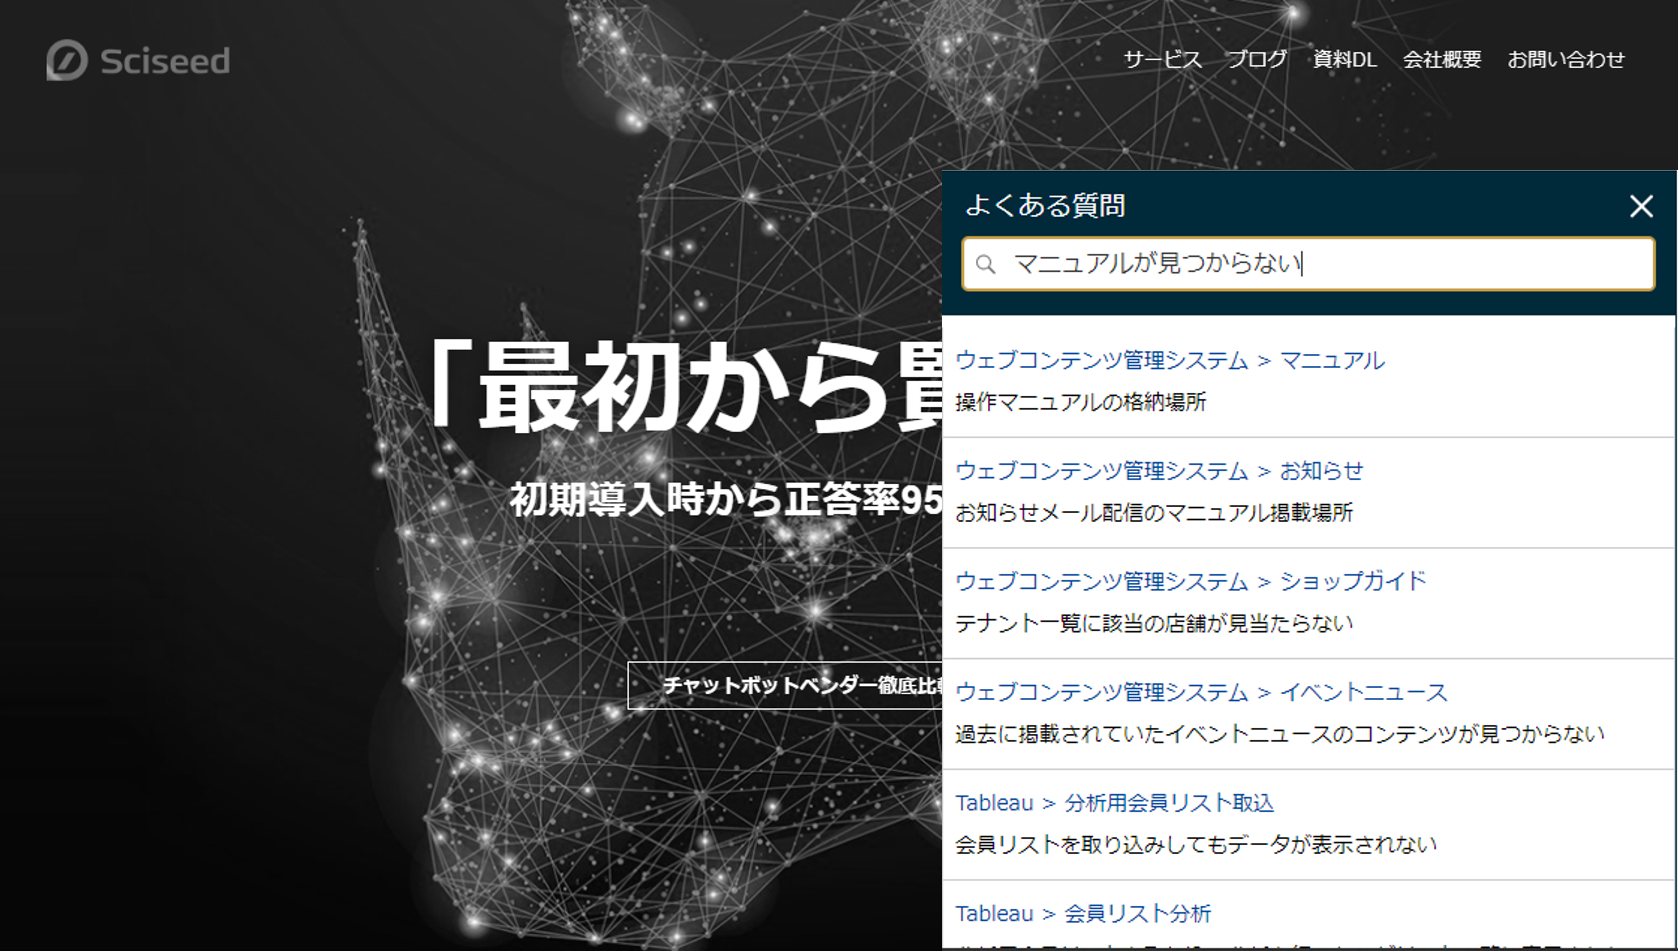 sAI Searchウインドウ型画面